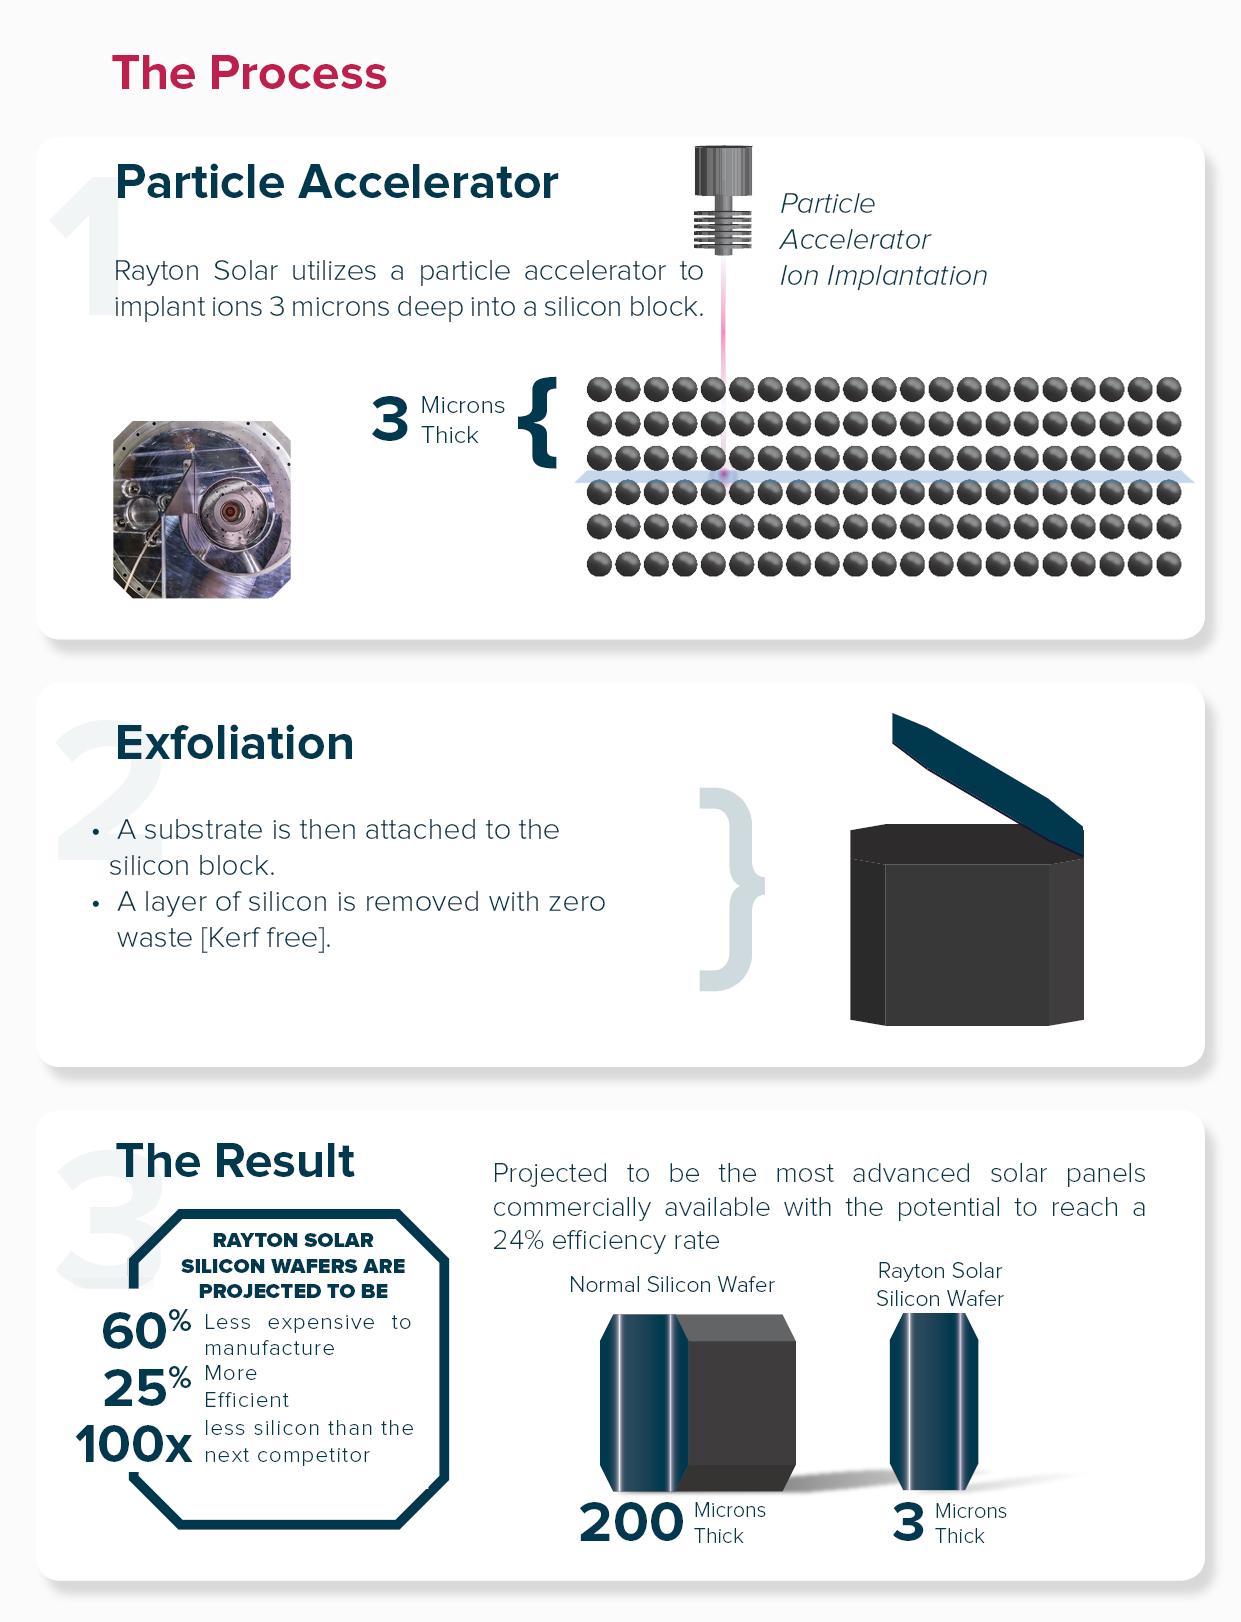 new solar panel technology - process